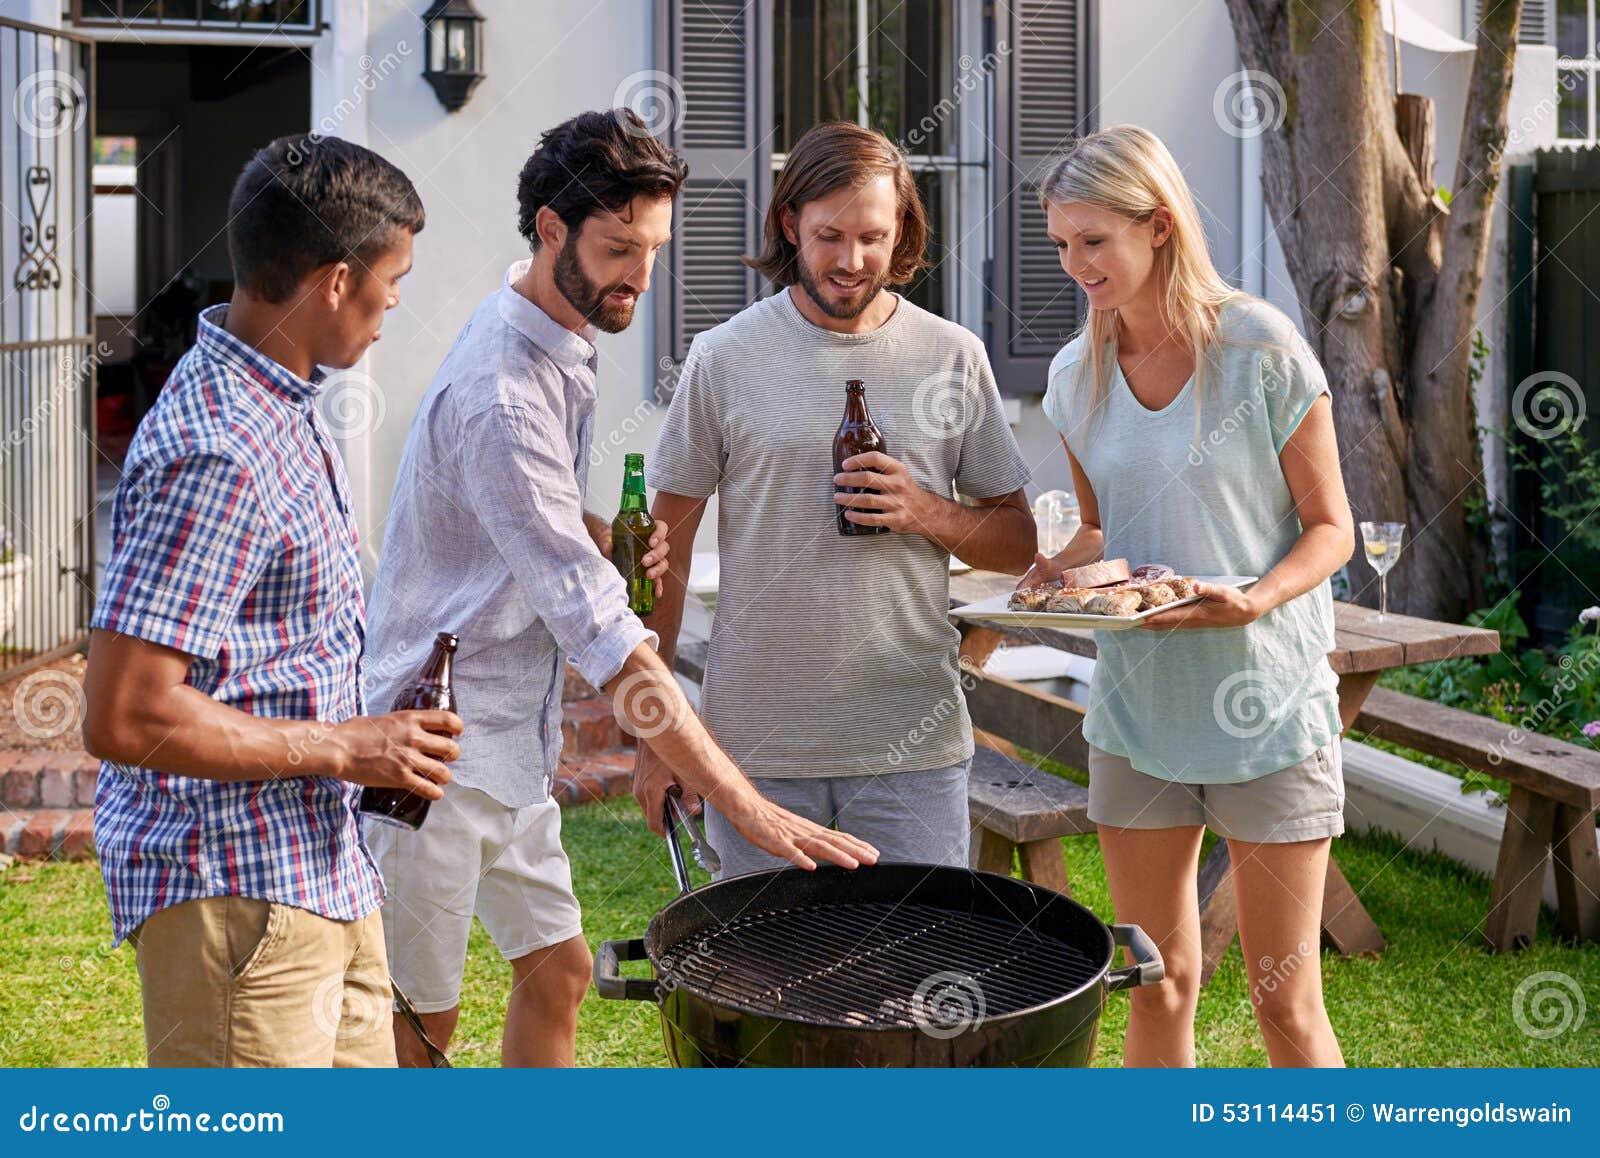 Bbq Garden Party Stock Photo - Image: 53114451